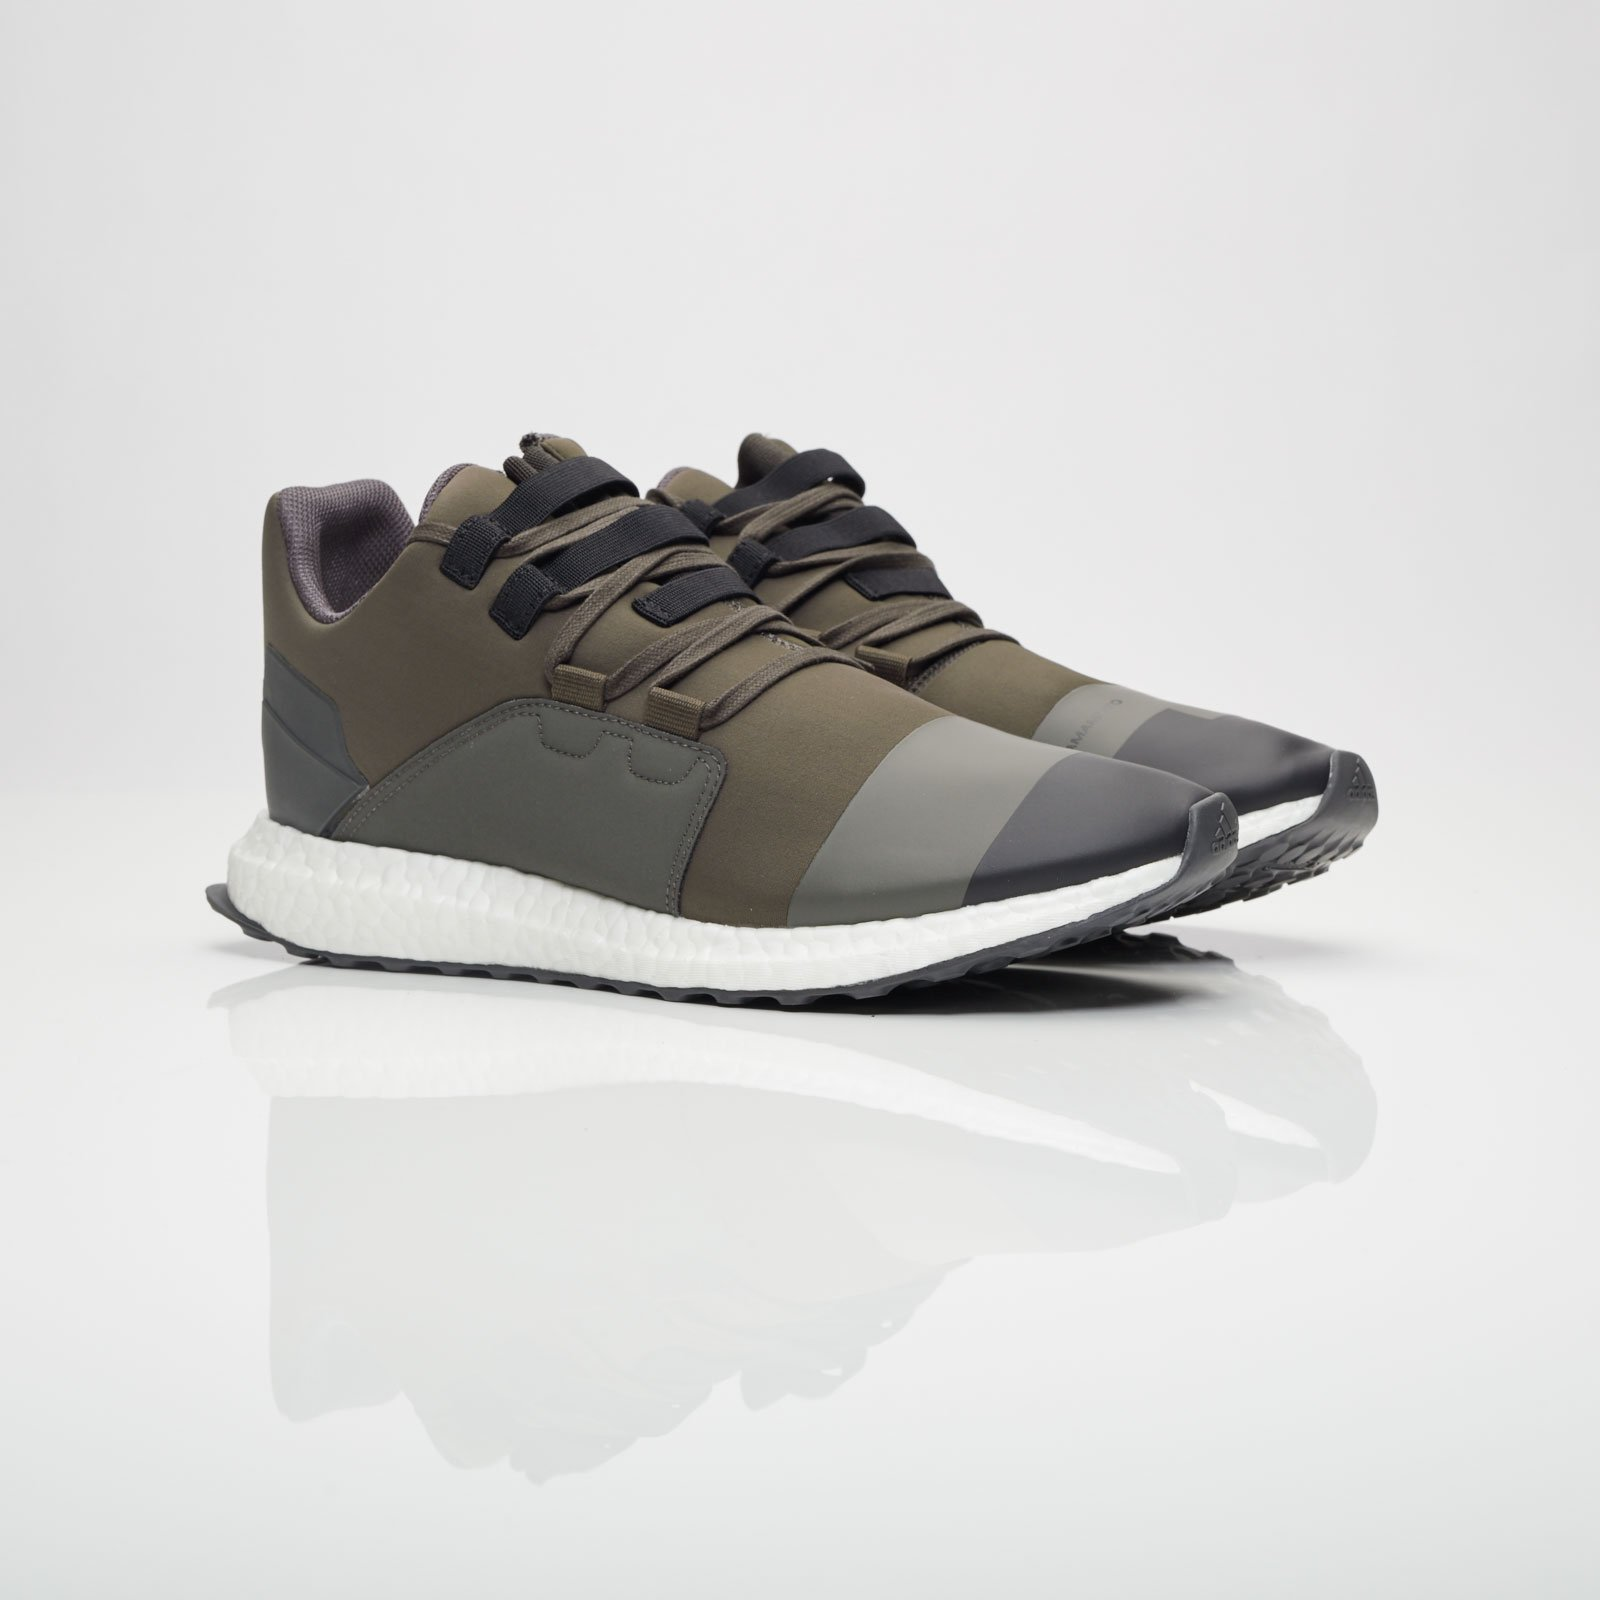 d9f767cb02e04 adidas Kozoko Low - Cg3161 - Sneakersnstuff